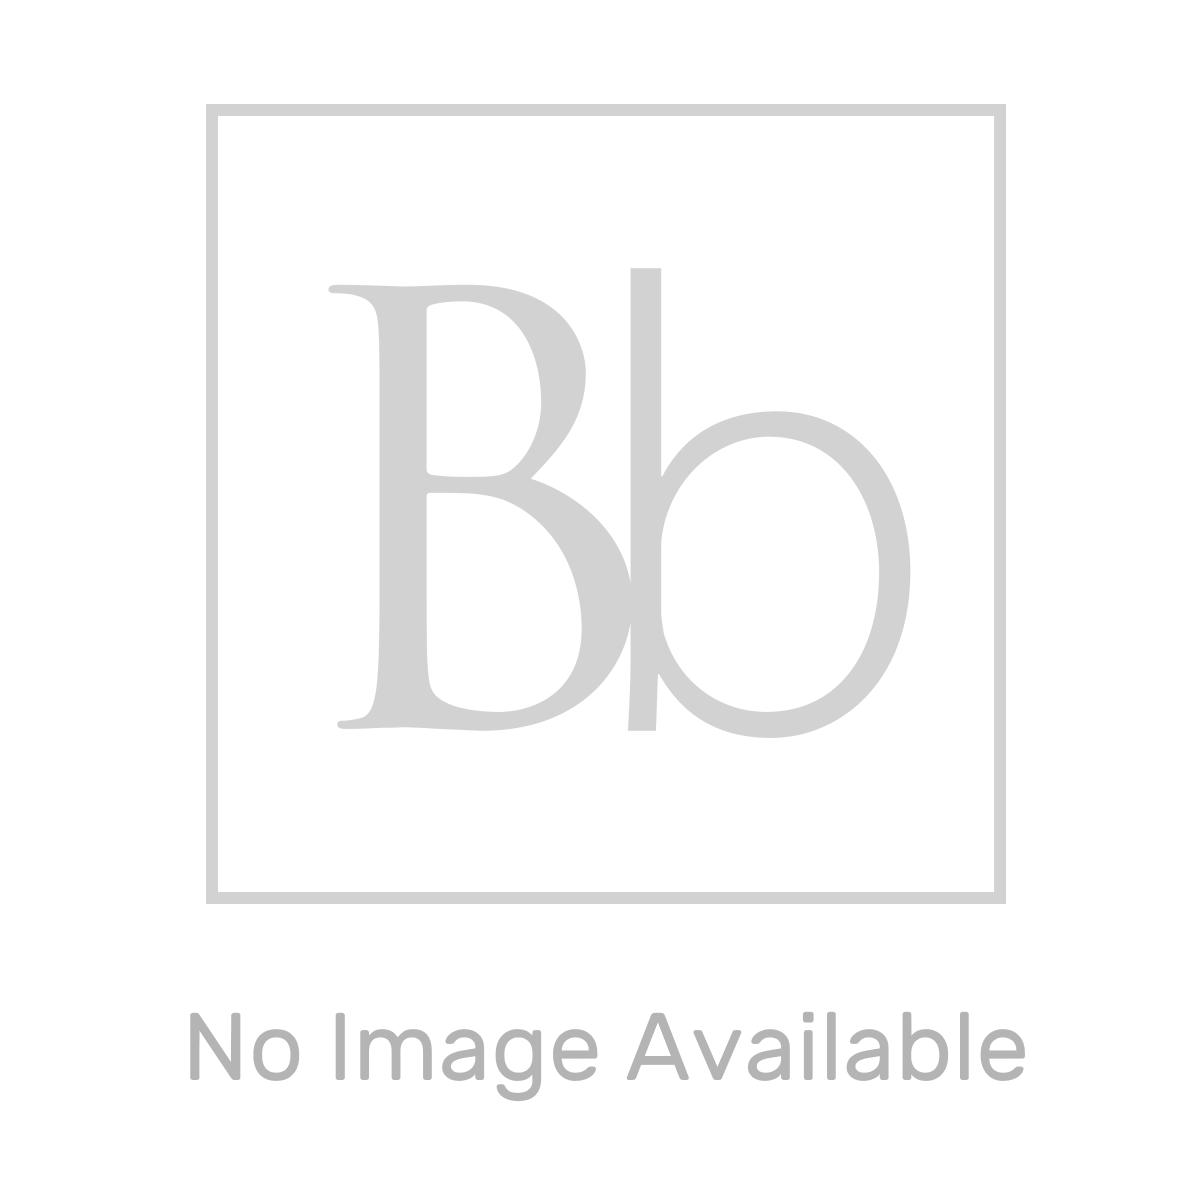 Aquadart Rectangular 1700 x 800 Shower Tray